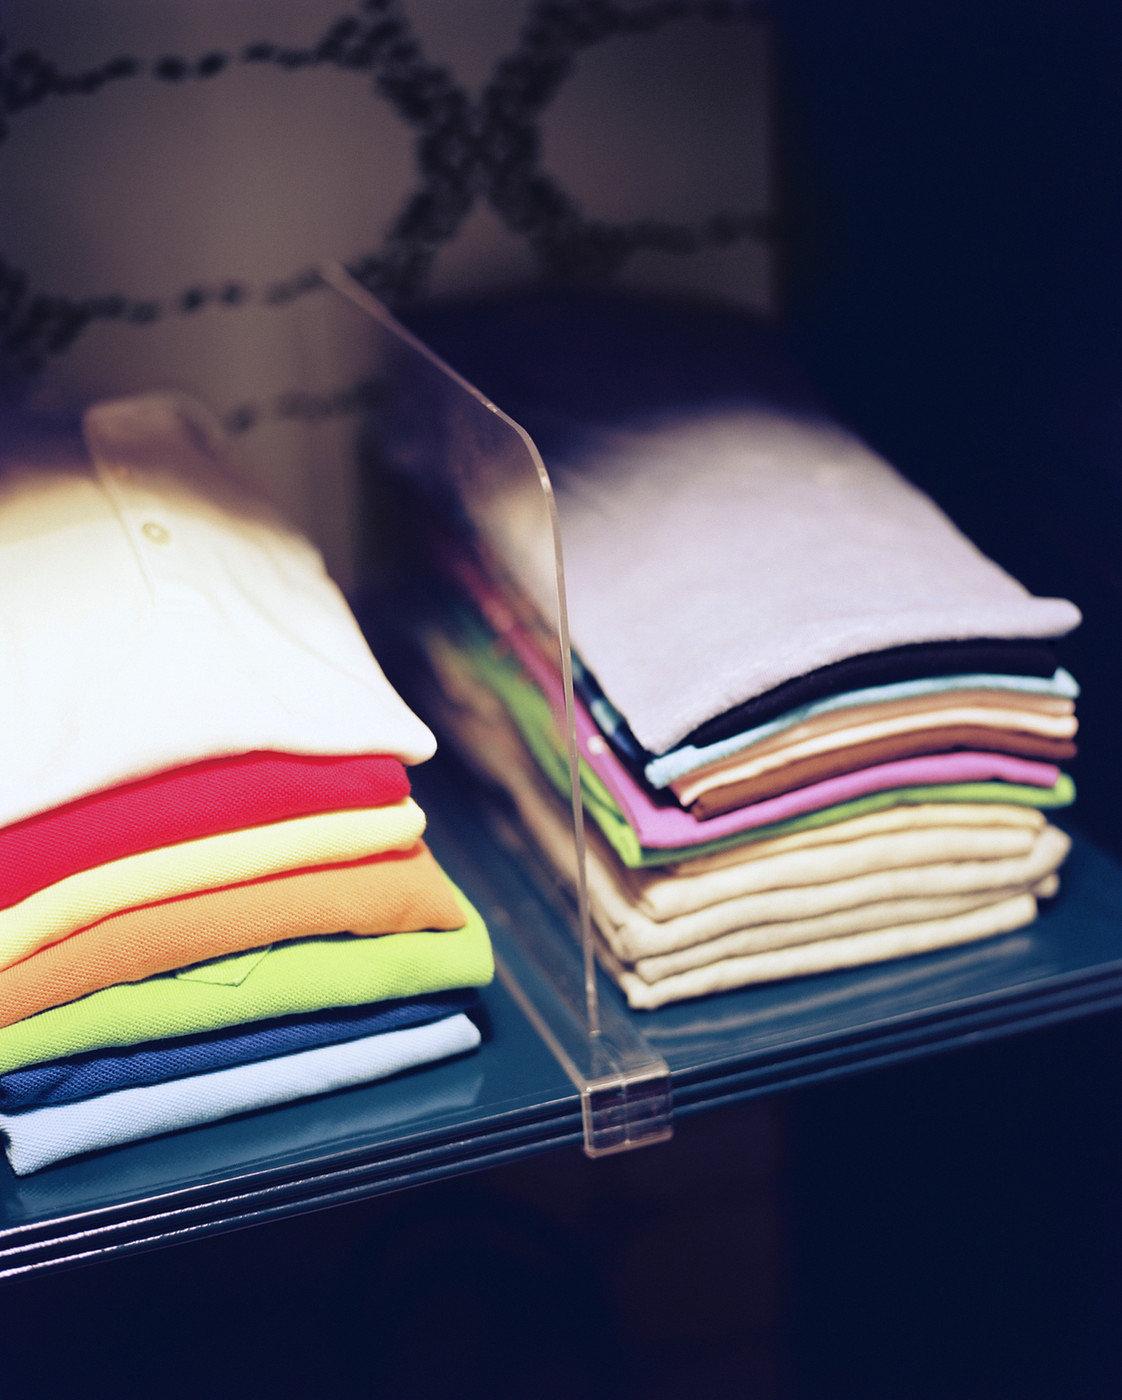 Neatly folded shirts in an organized closet